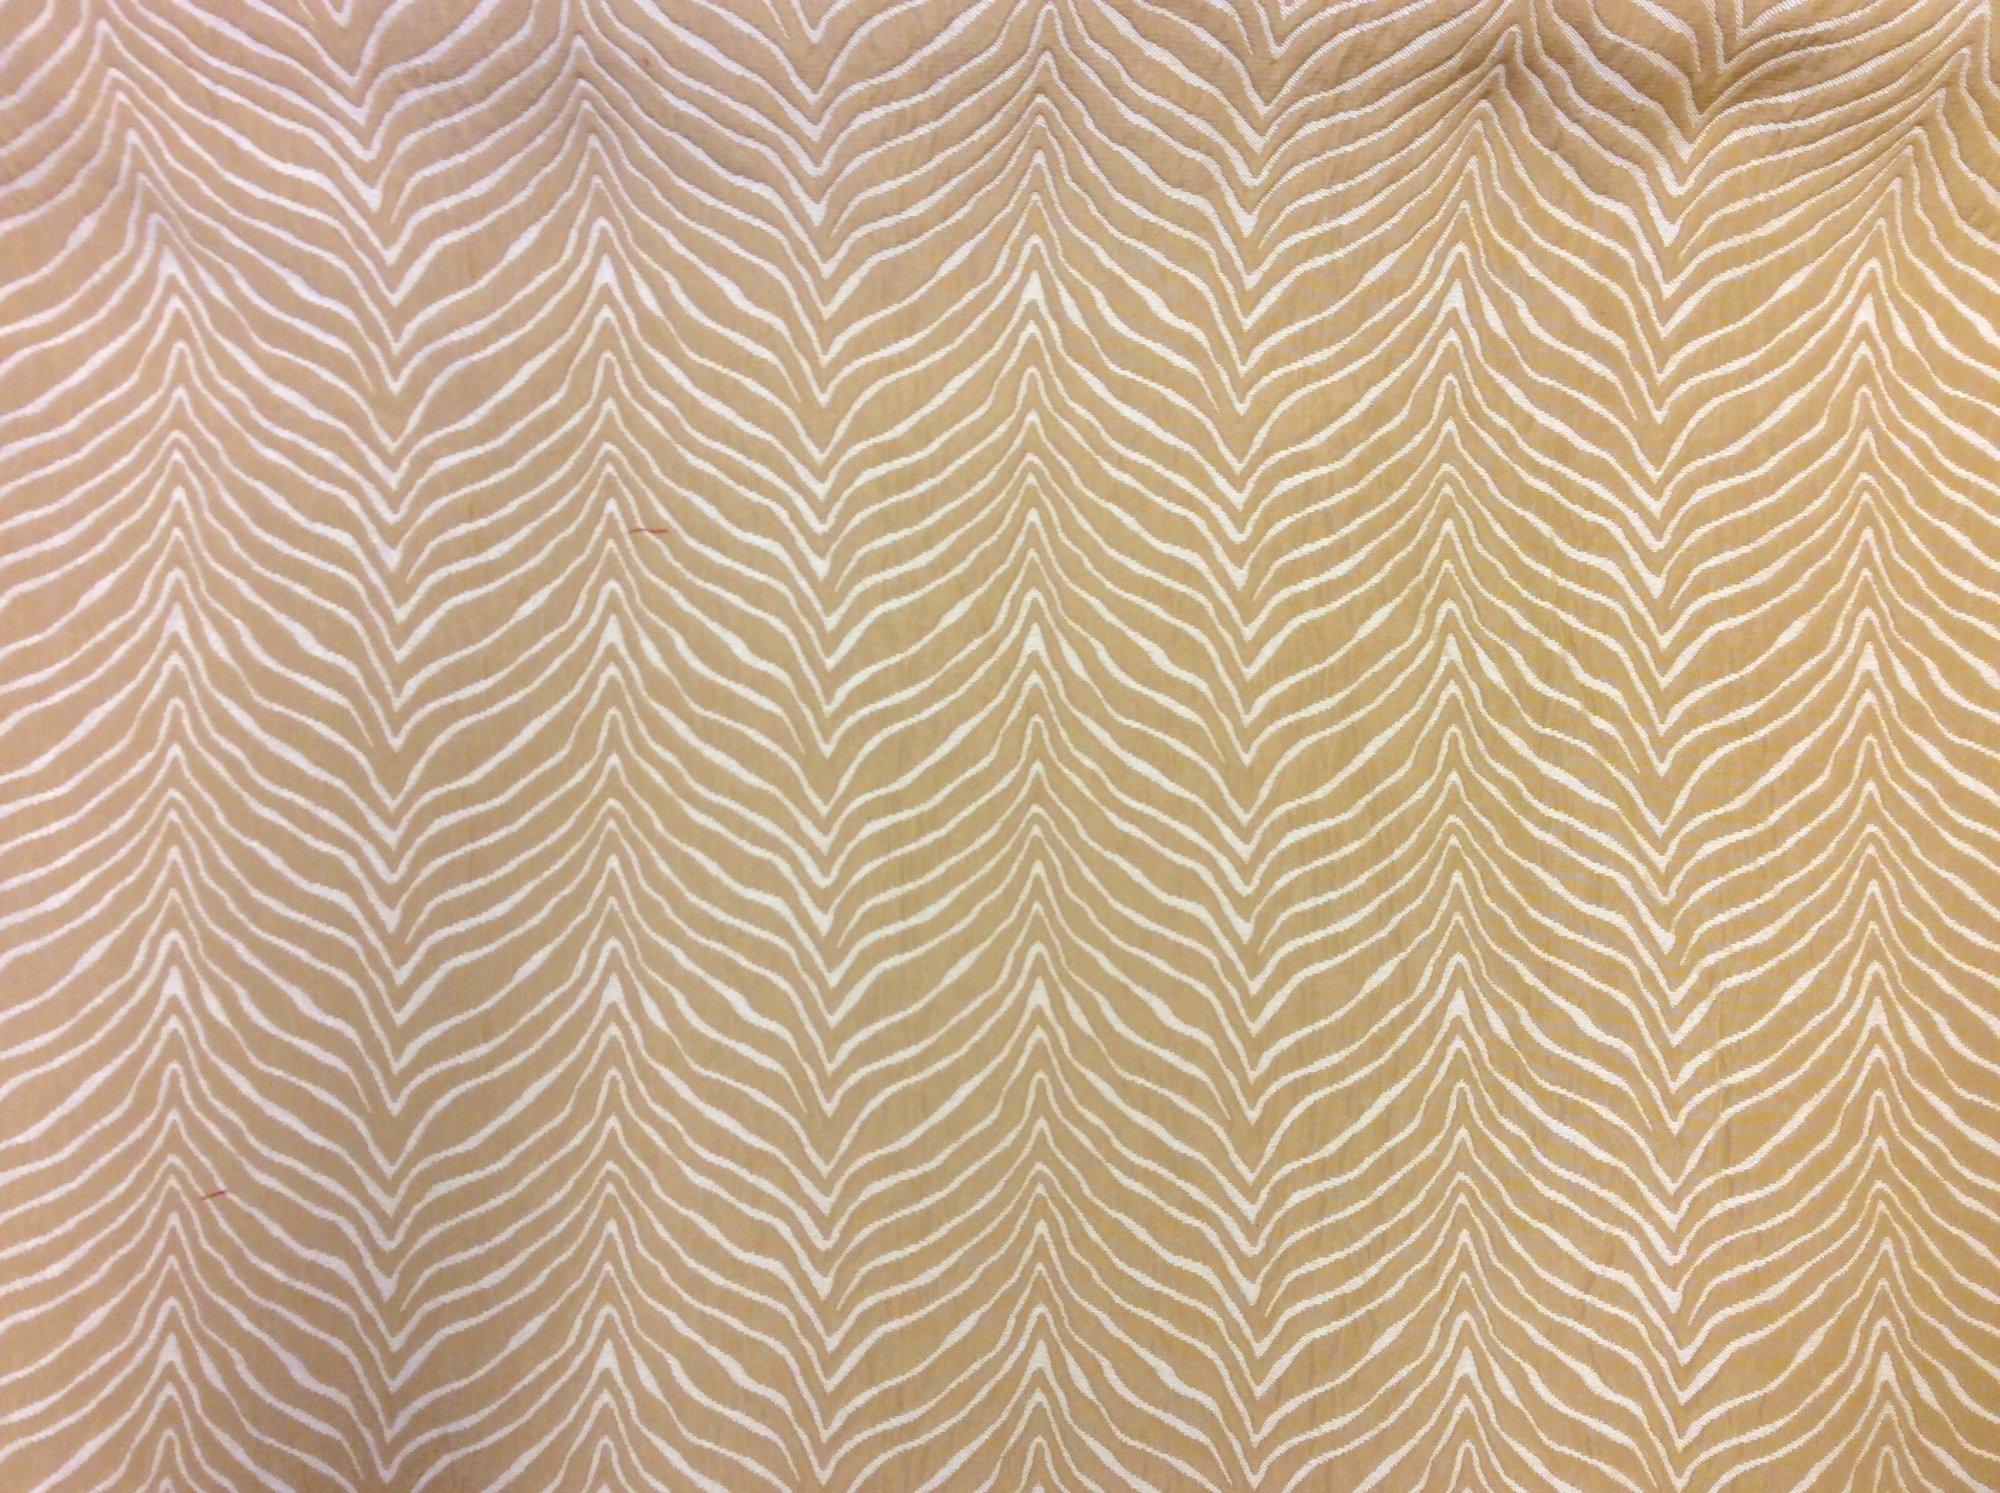 Heavy Upholstery Gold Zebra Woven Home Decor Fabric LOS001